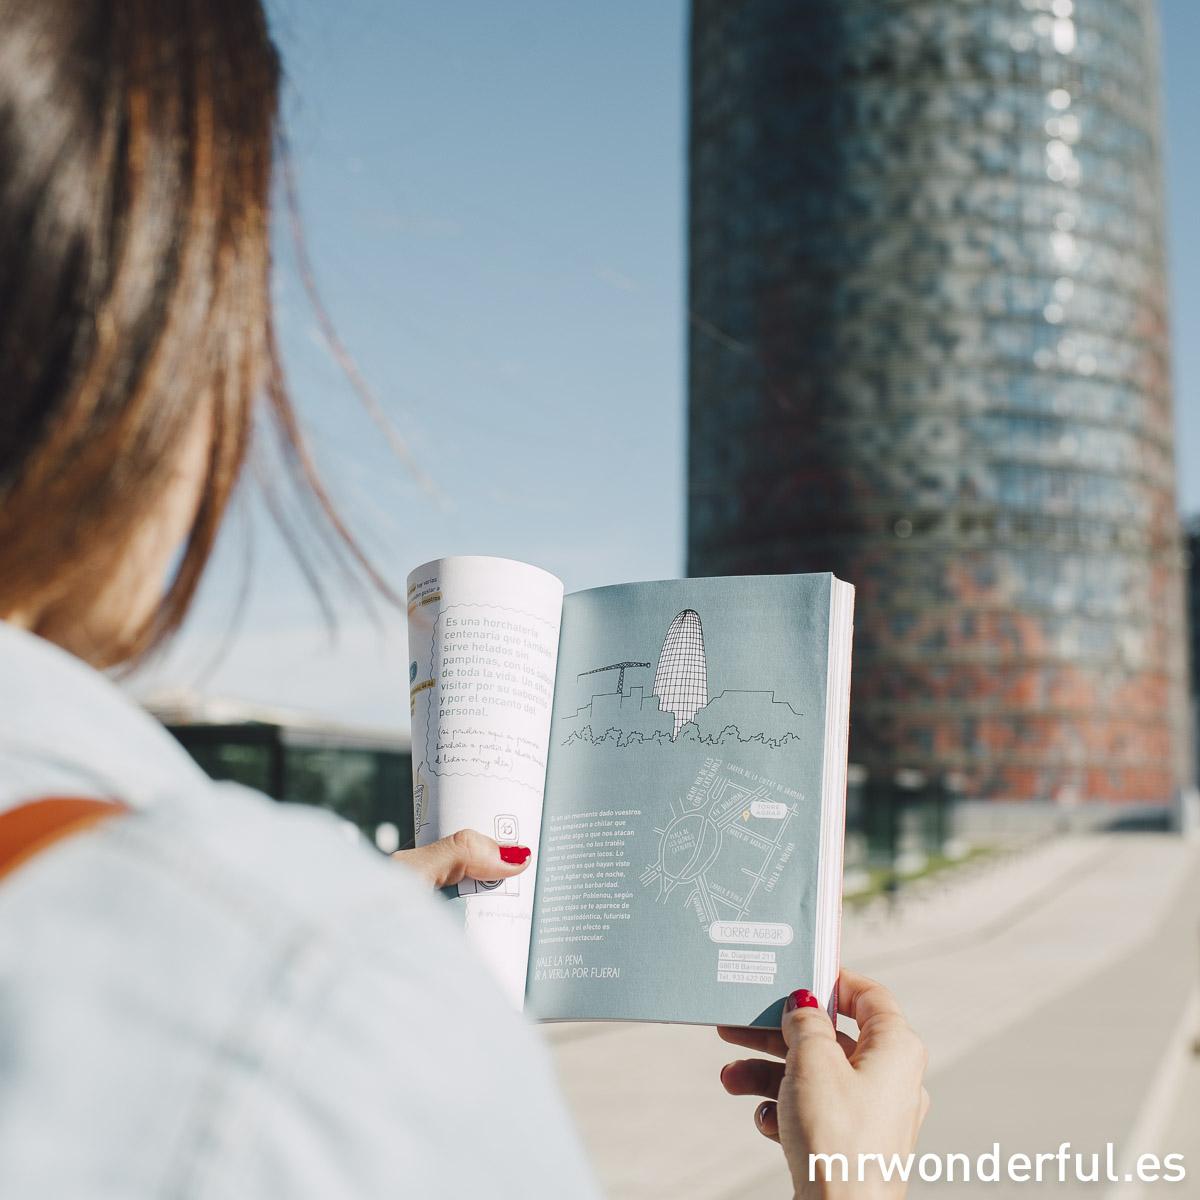 mrwonderful_guia_01_guia-no-aburrida-finde-barcelona-6